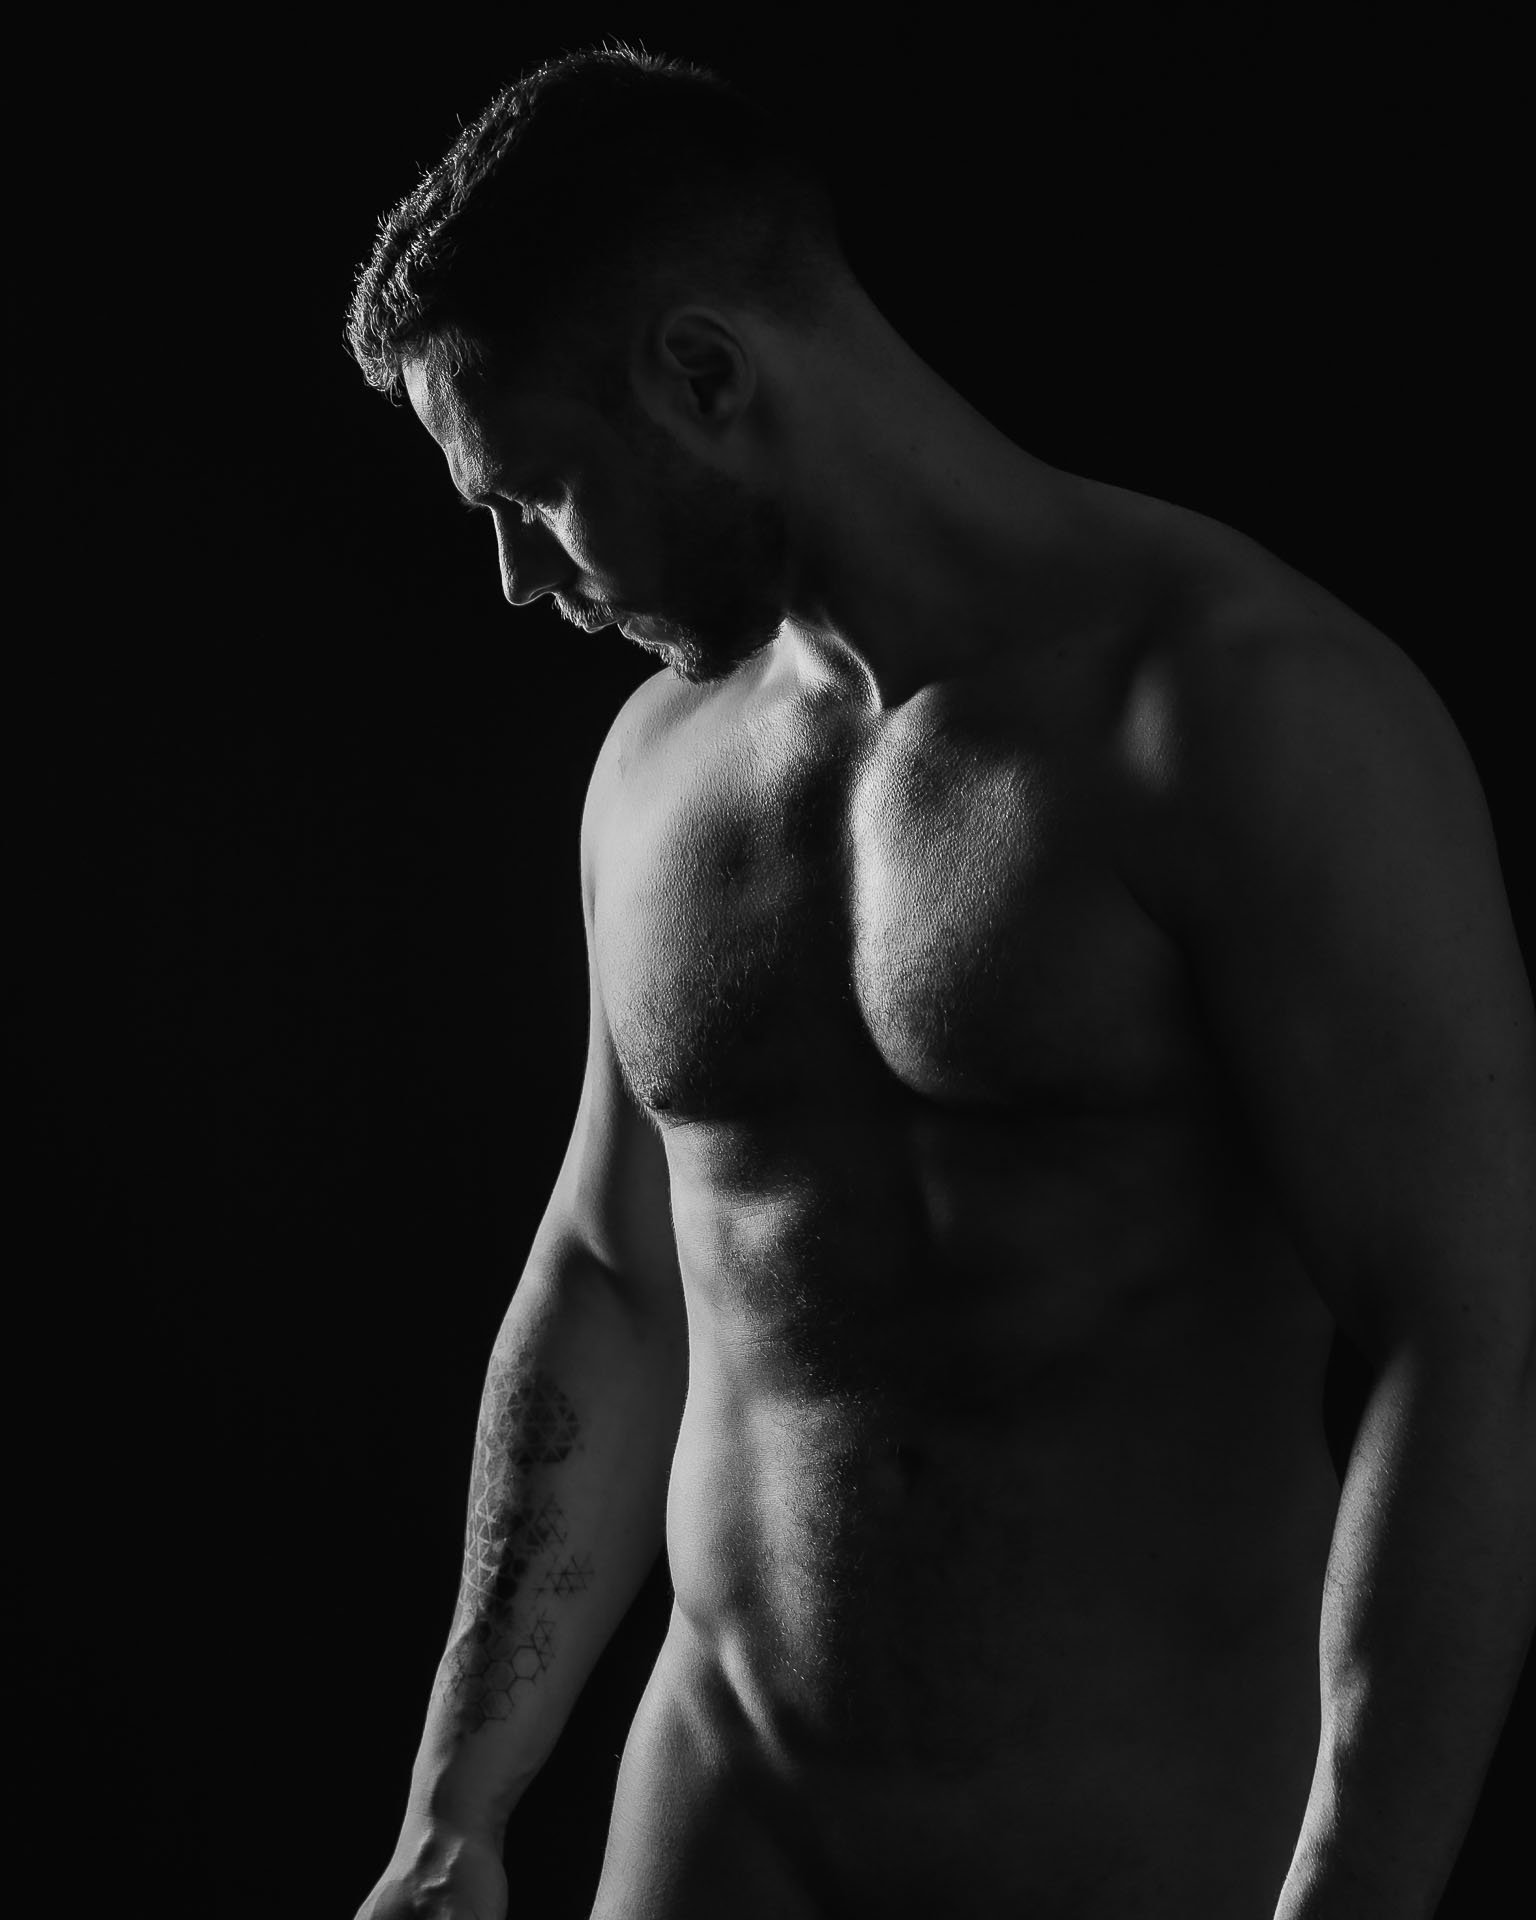 Männerfotografie, Aktshooting, Akt-Fotograf in Berlin für Männer